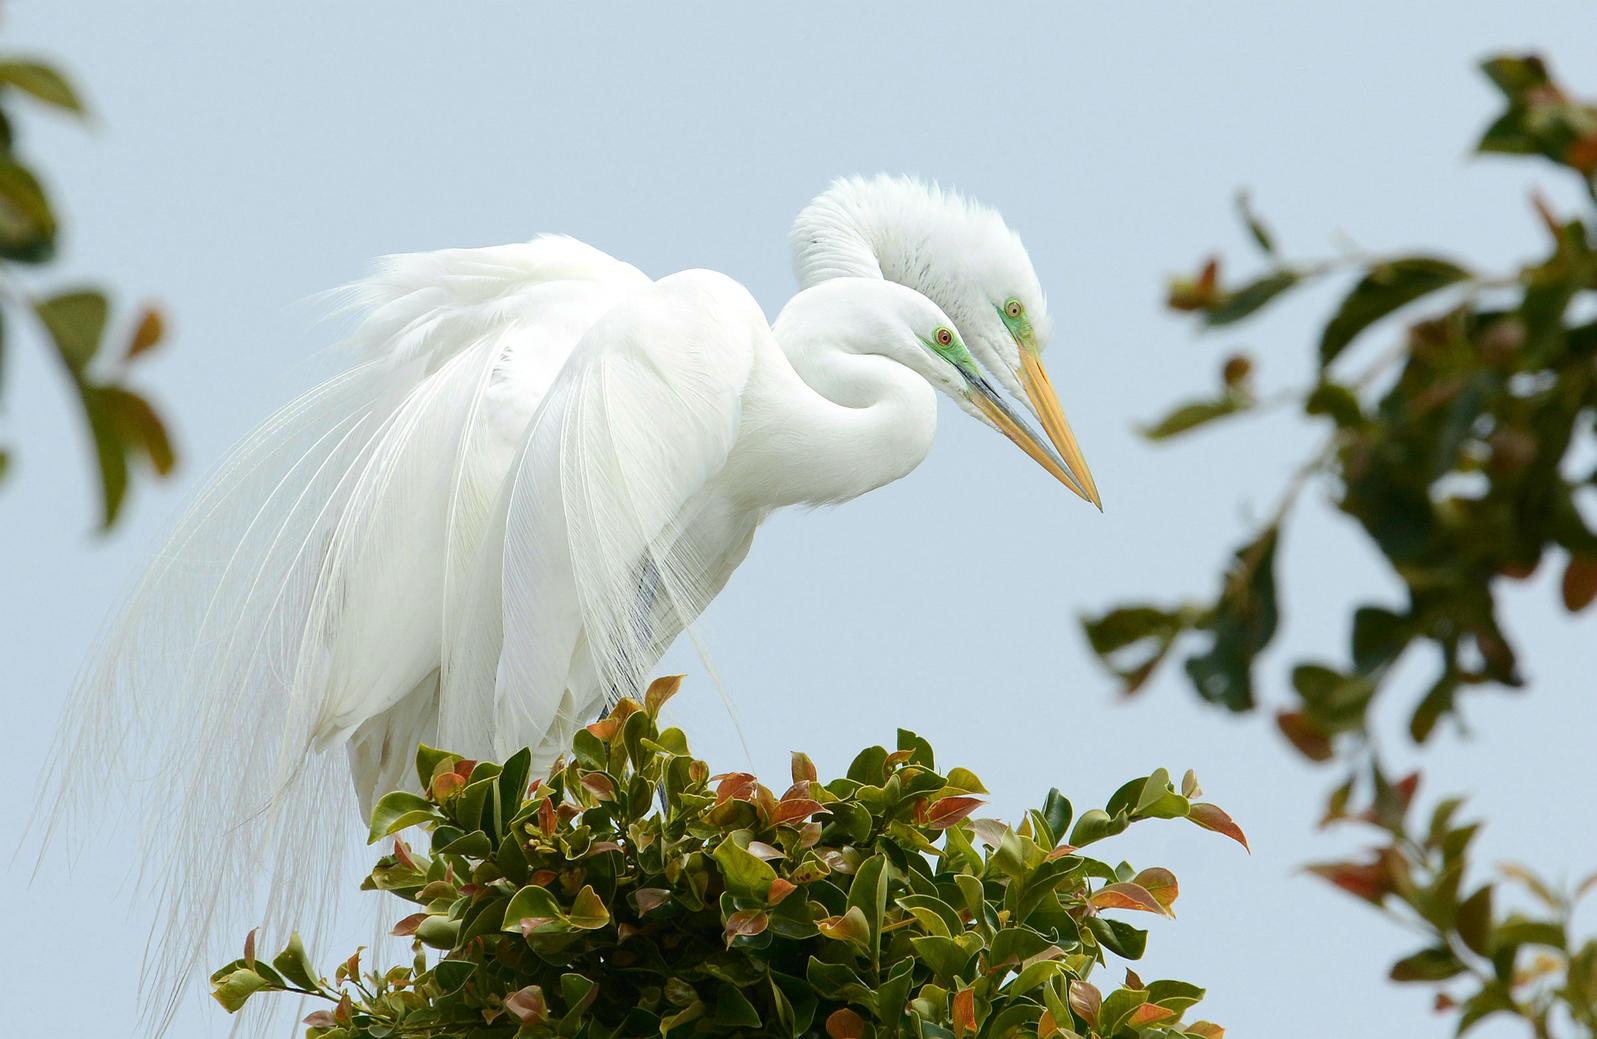 Great Egrets. Fraida Gutovich/Audubon Photography Awards